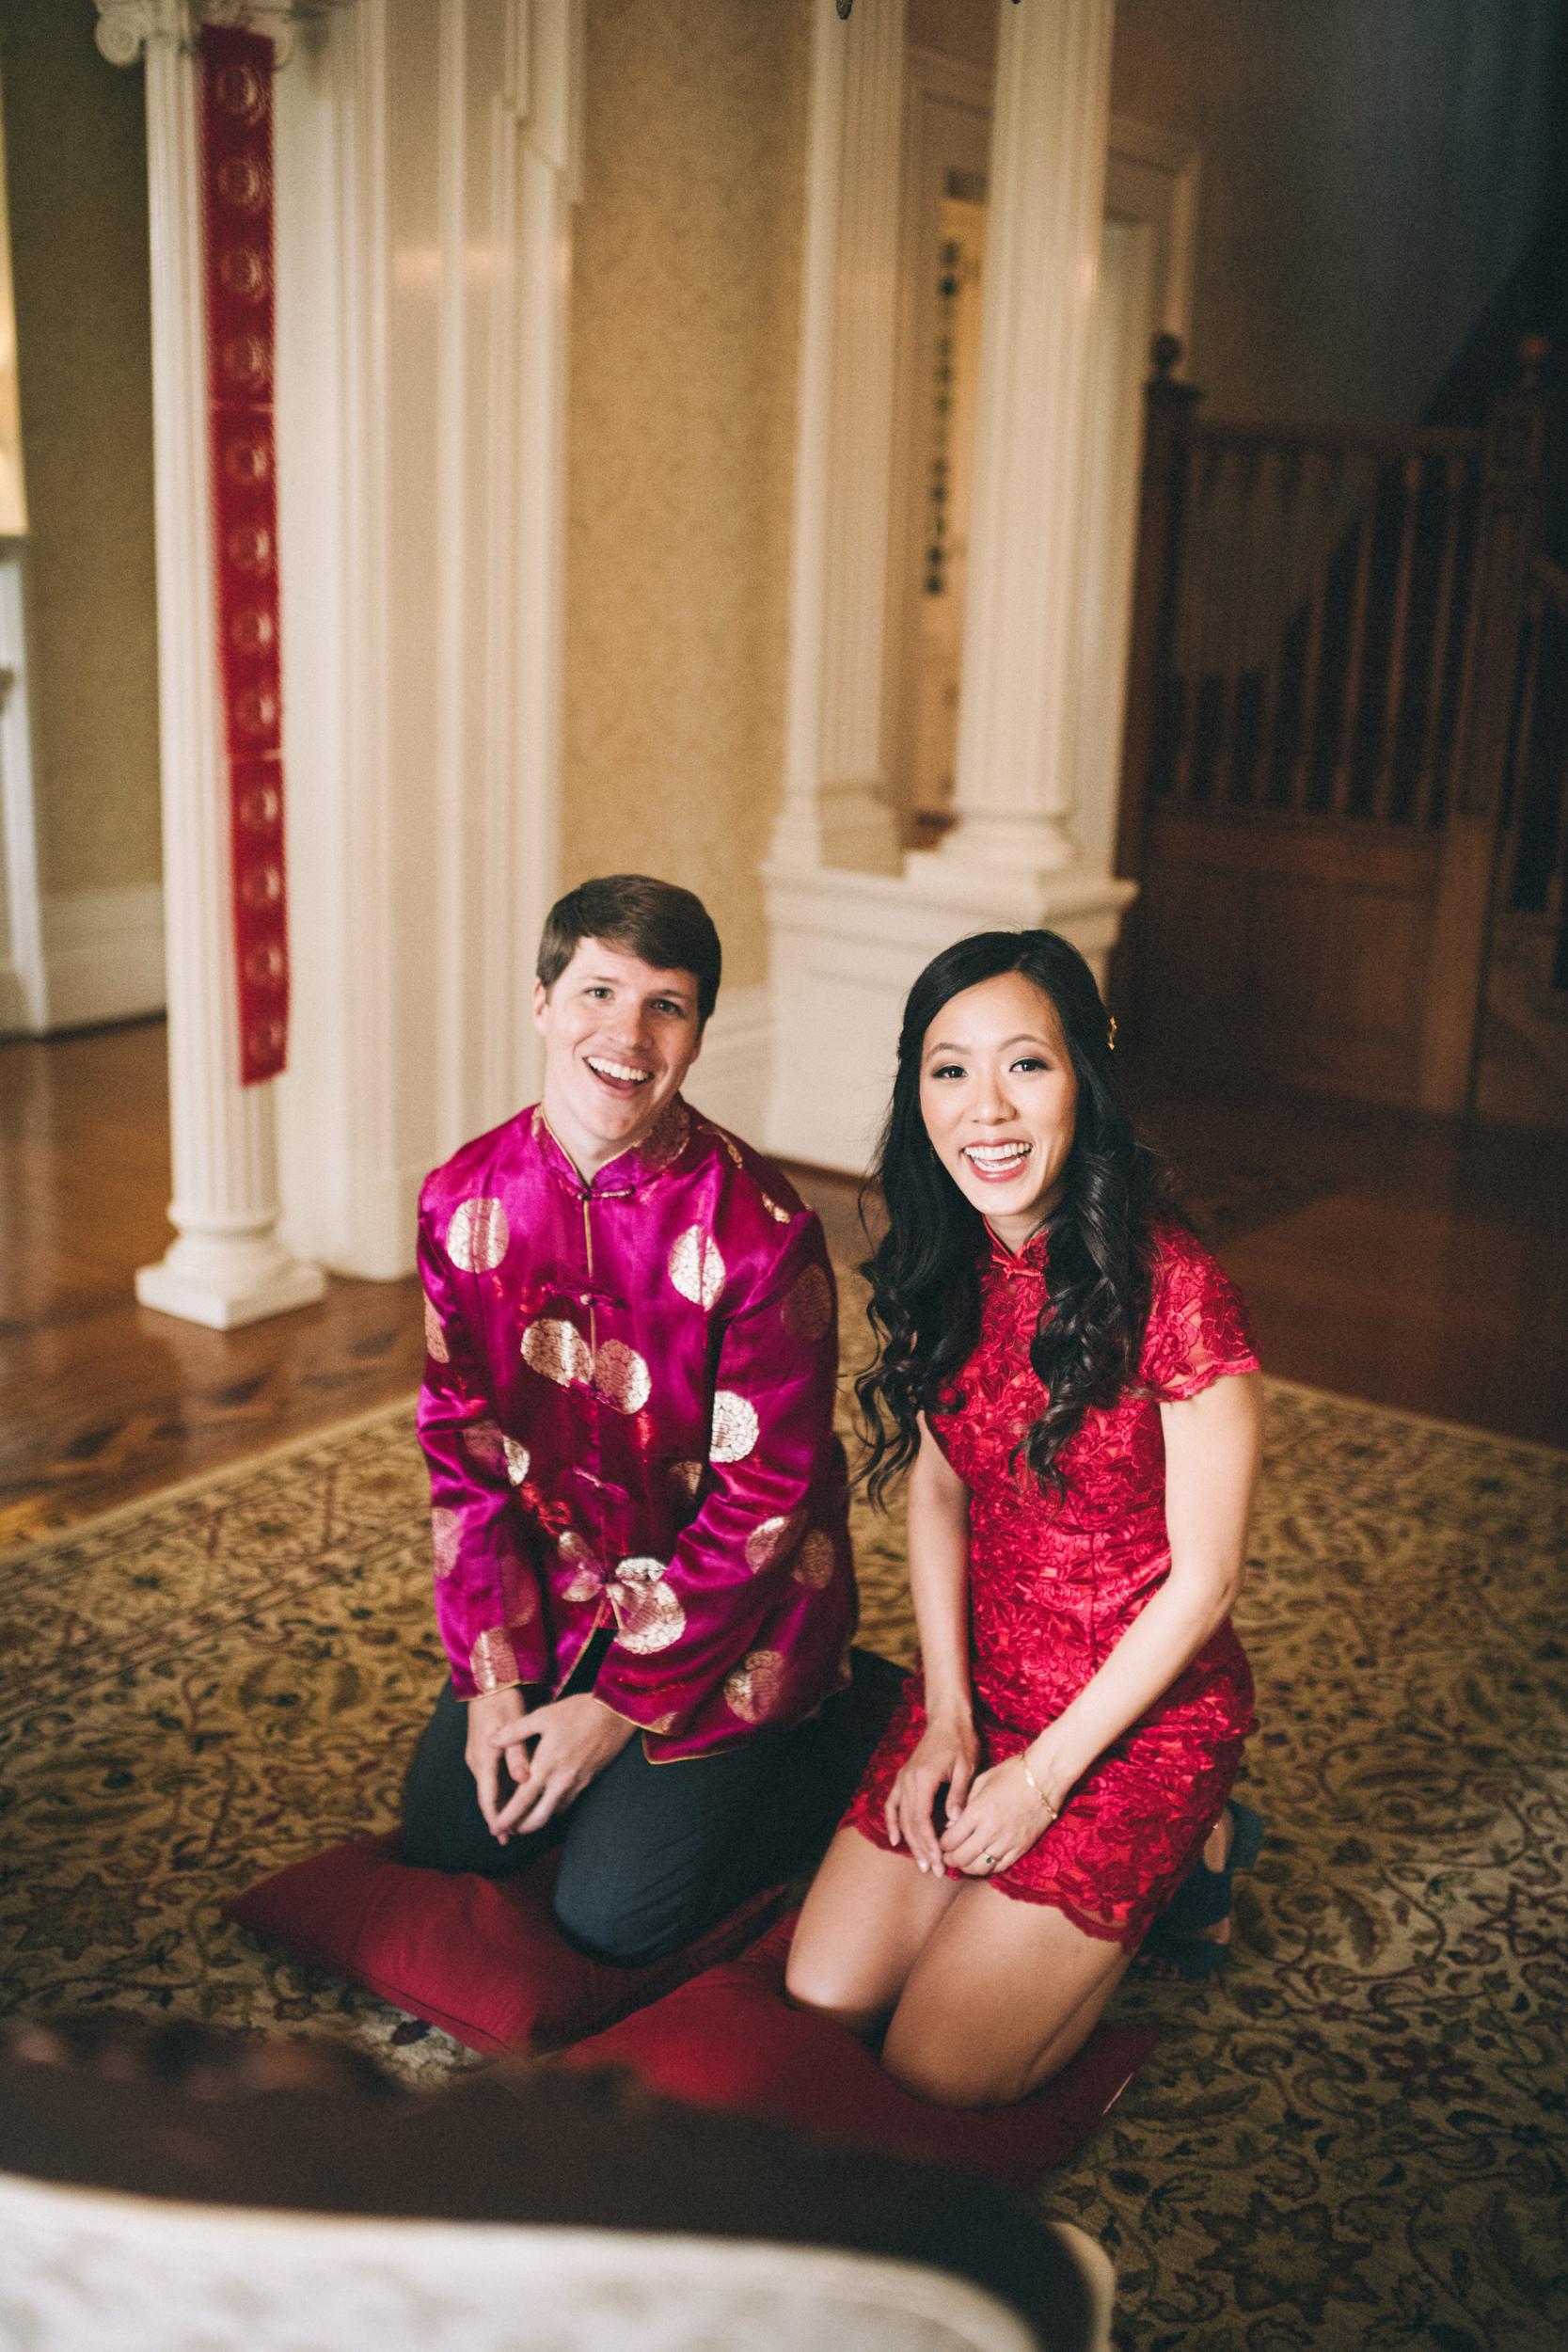 Louisville-Kentucky-Wedding-and-Elopement-Photographer-Sarah-Katherine-Davis-Photography-Summer-Jewel-Toned-Wedding-Chineese-Tea-Ceremony-Warrenwood-Manor-Danville-330.jpg